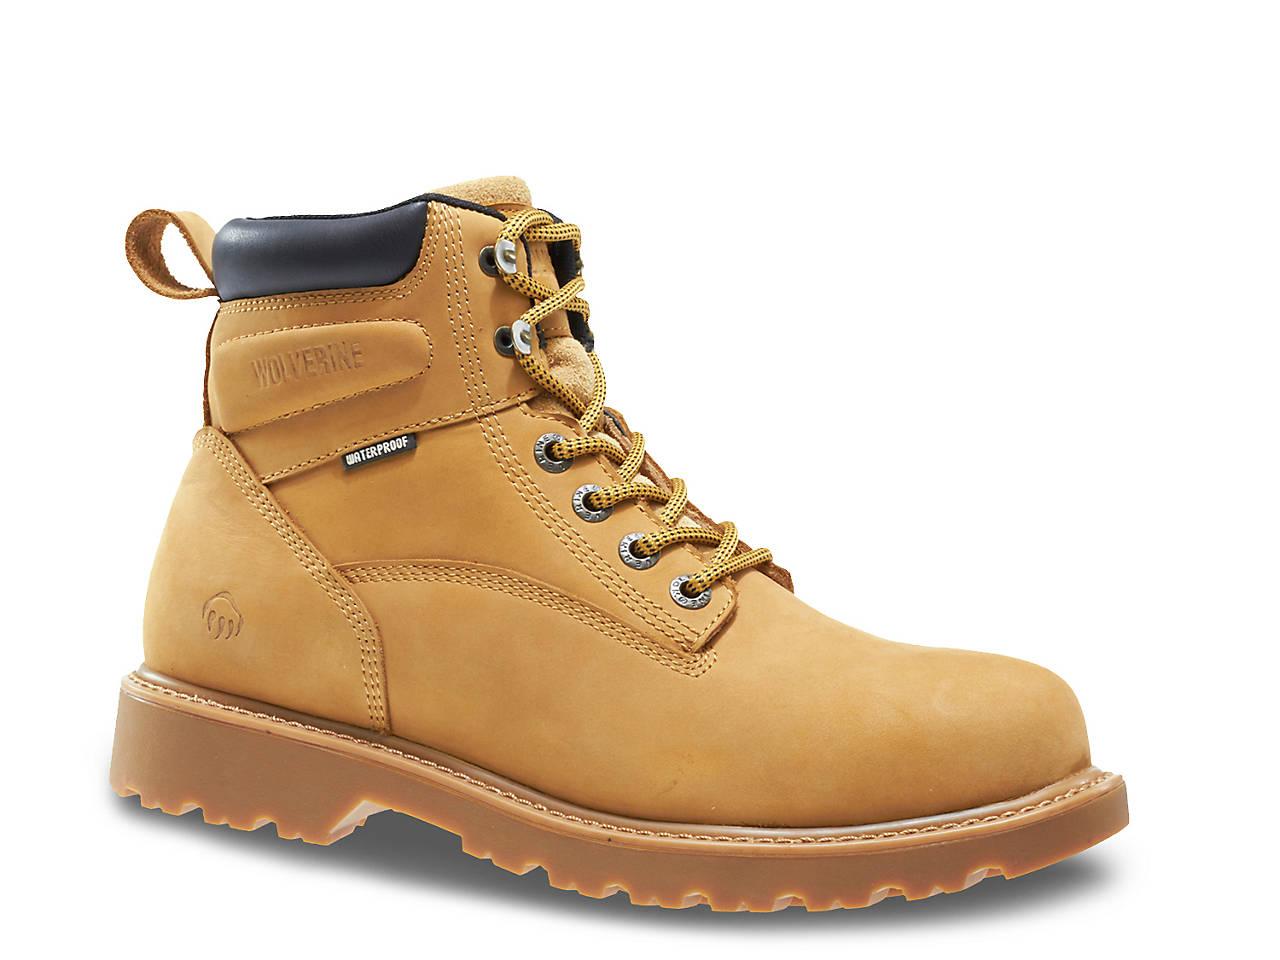 adfaf52b2e4 Floorhand Steel Toe Work Boot